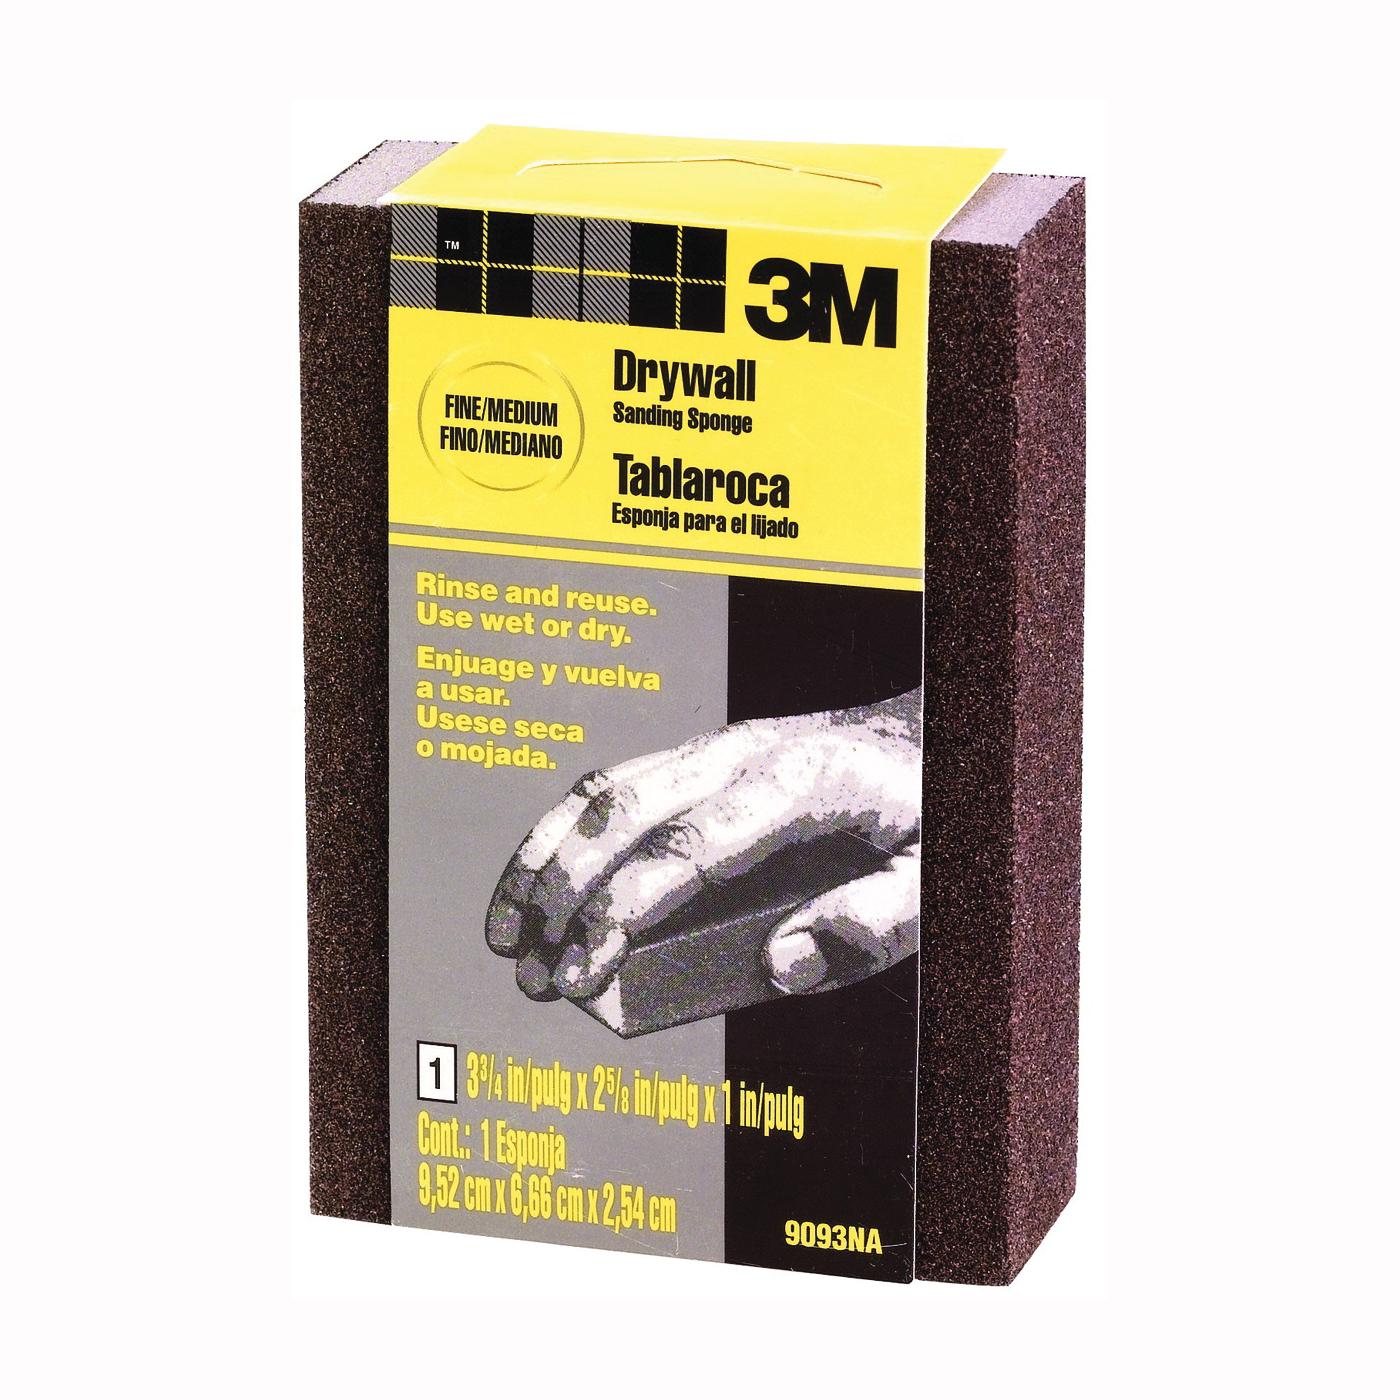 Picture of 3M 9093 Sanding Sponge, 3-3/4 in L, 2-5/8 in W, Fine/Medium